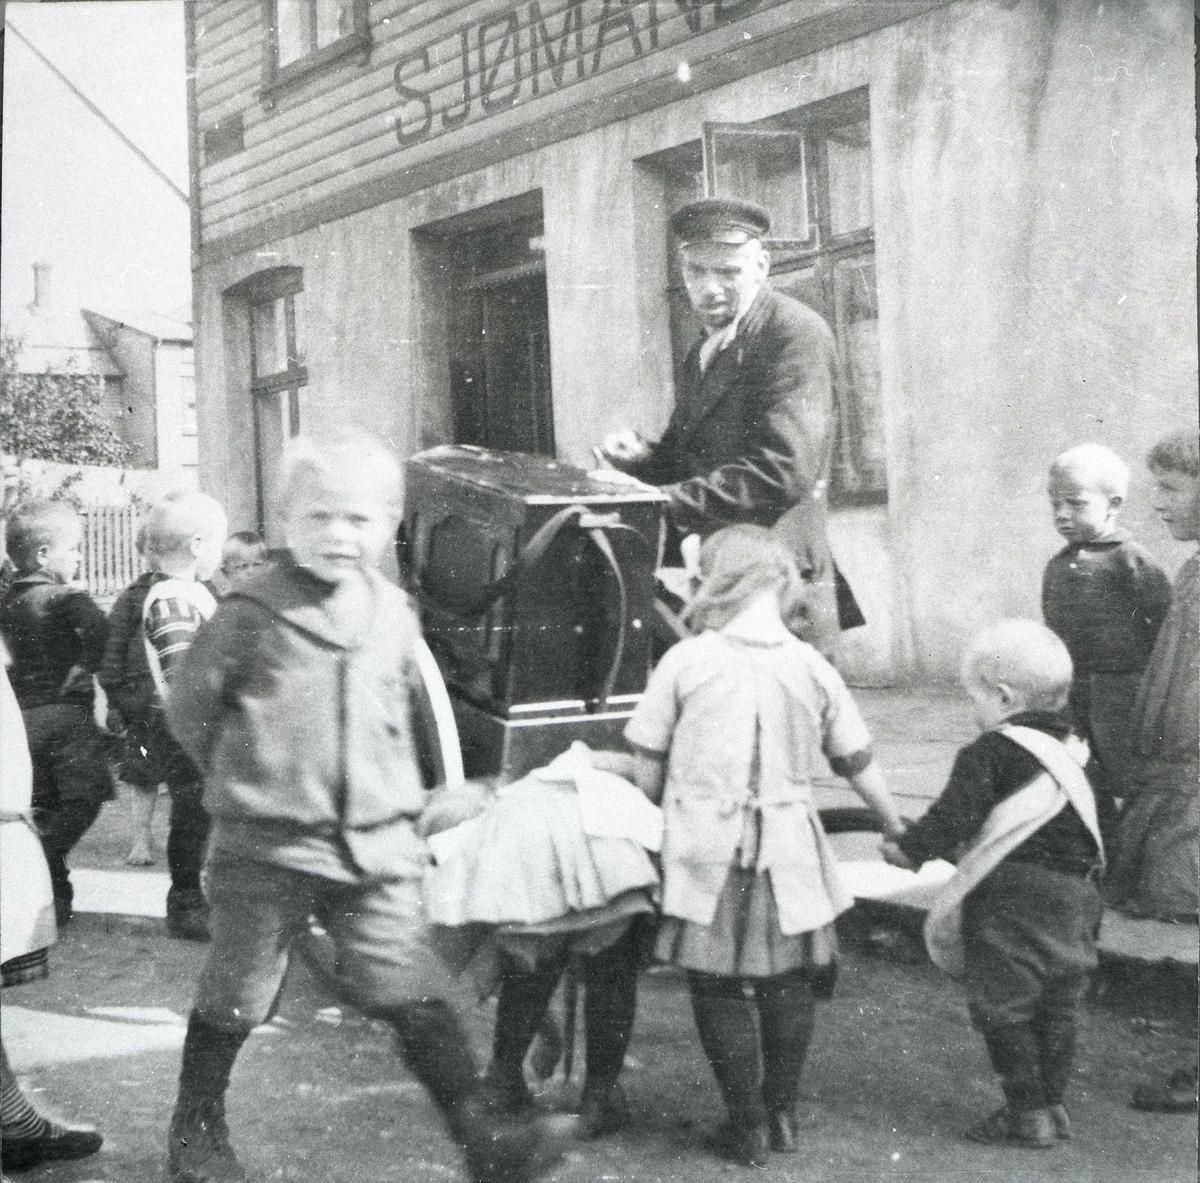 Lire-Teodor med lirekasse. Flere barn rundt ham. På husveggen bak ham står: Sjømand......